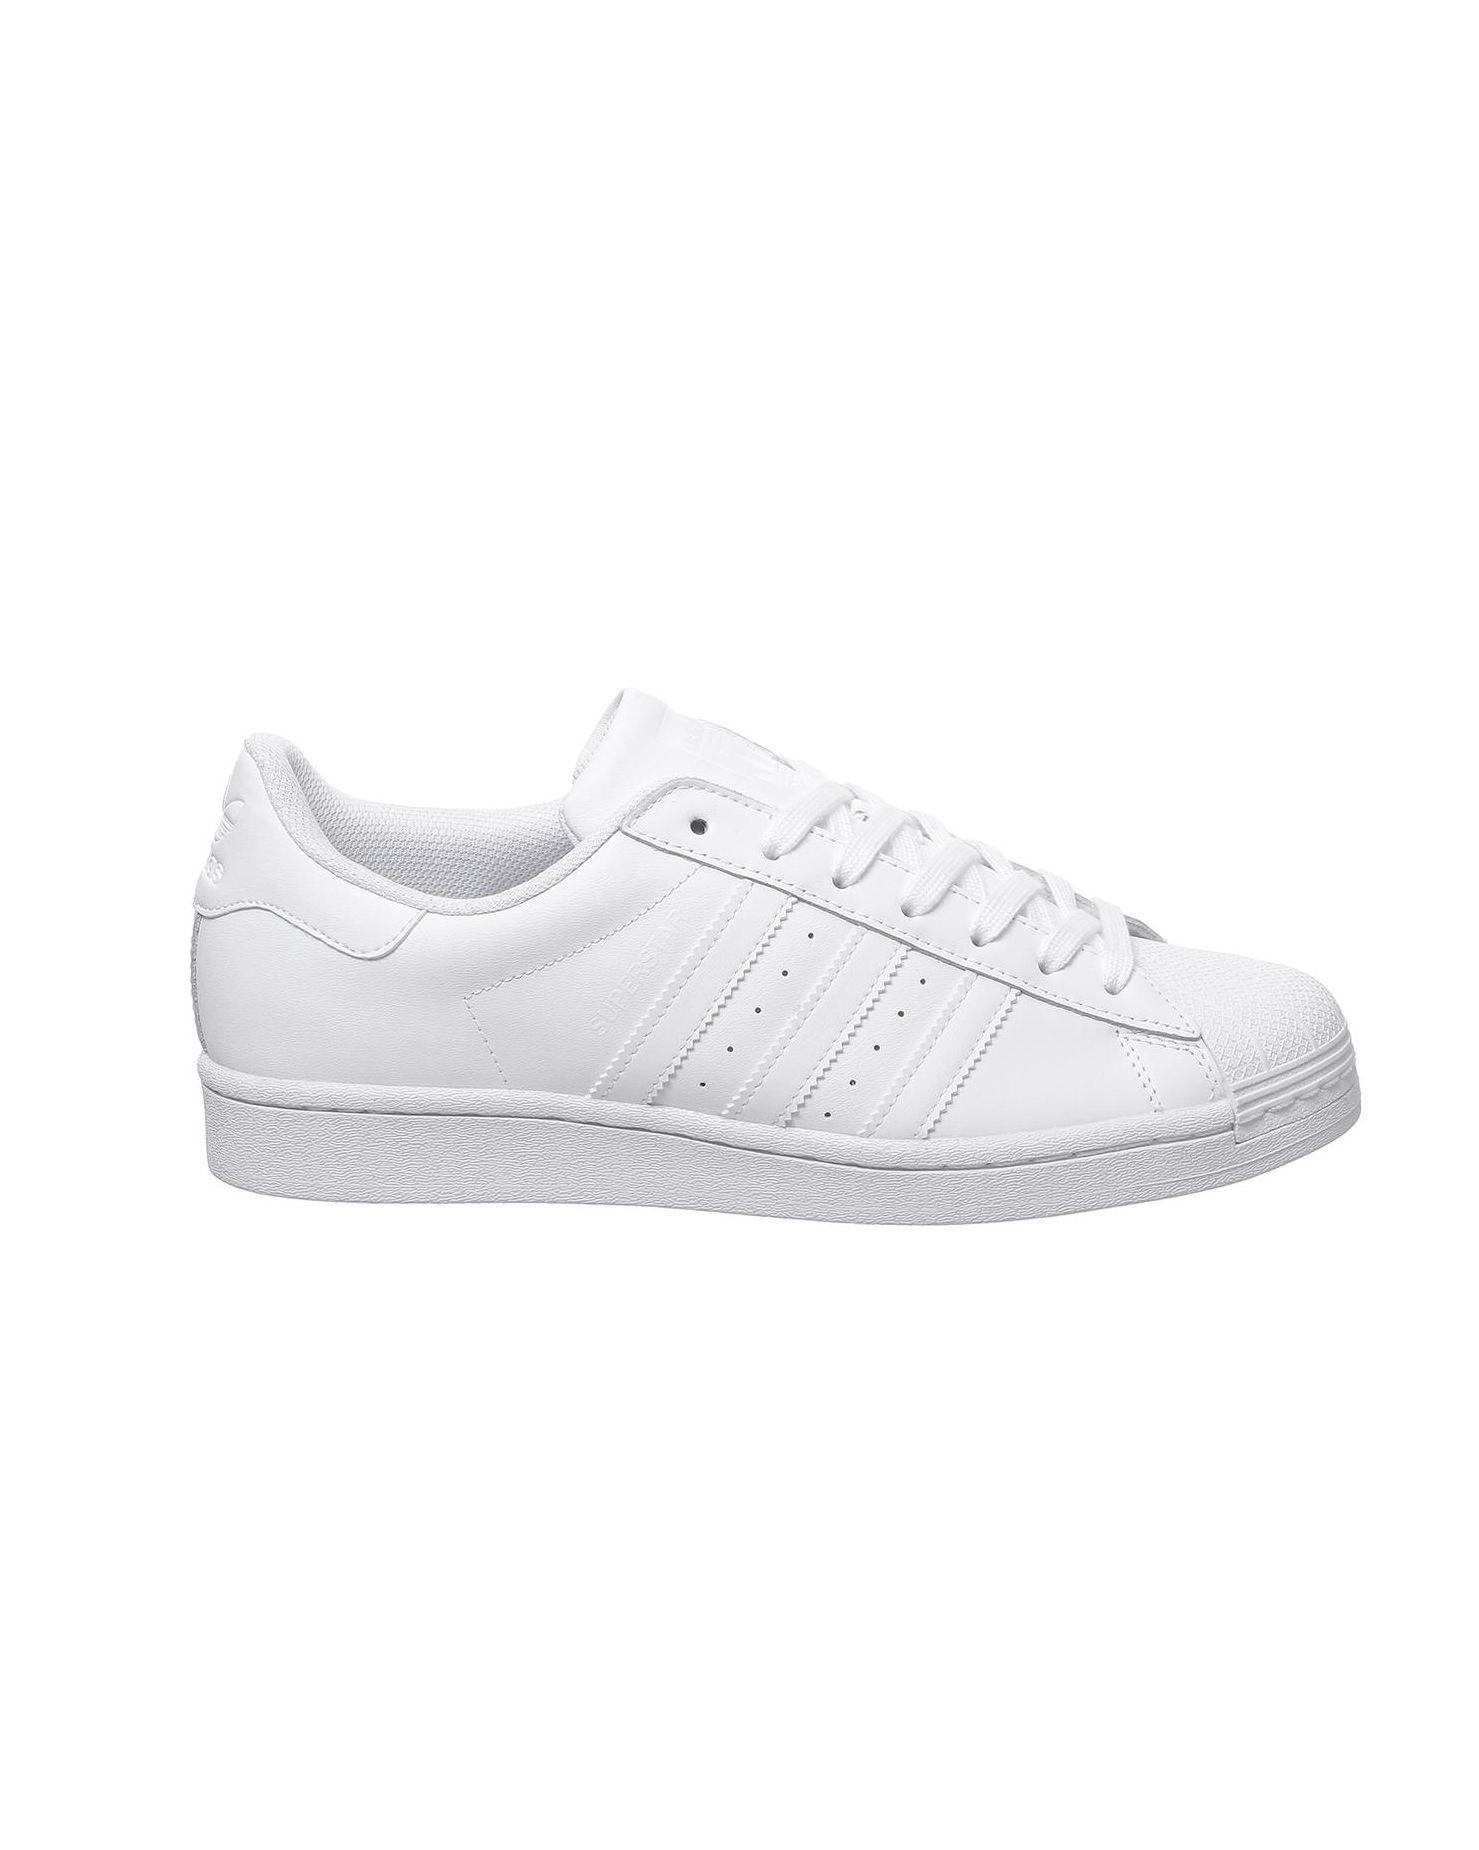 Women's white trainers: best white